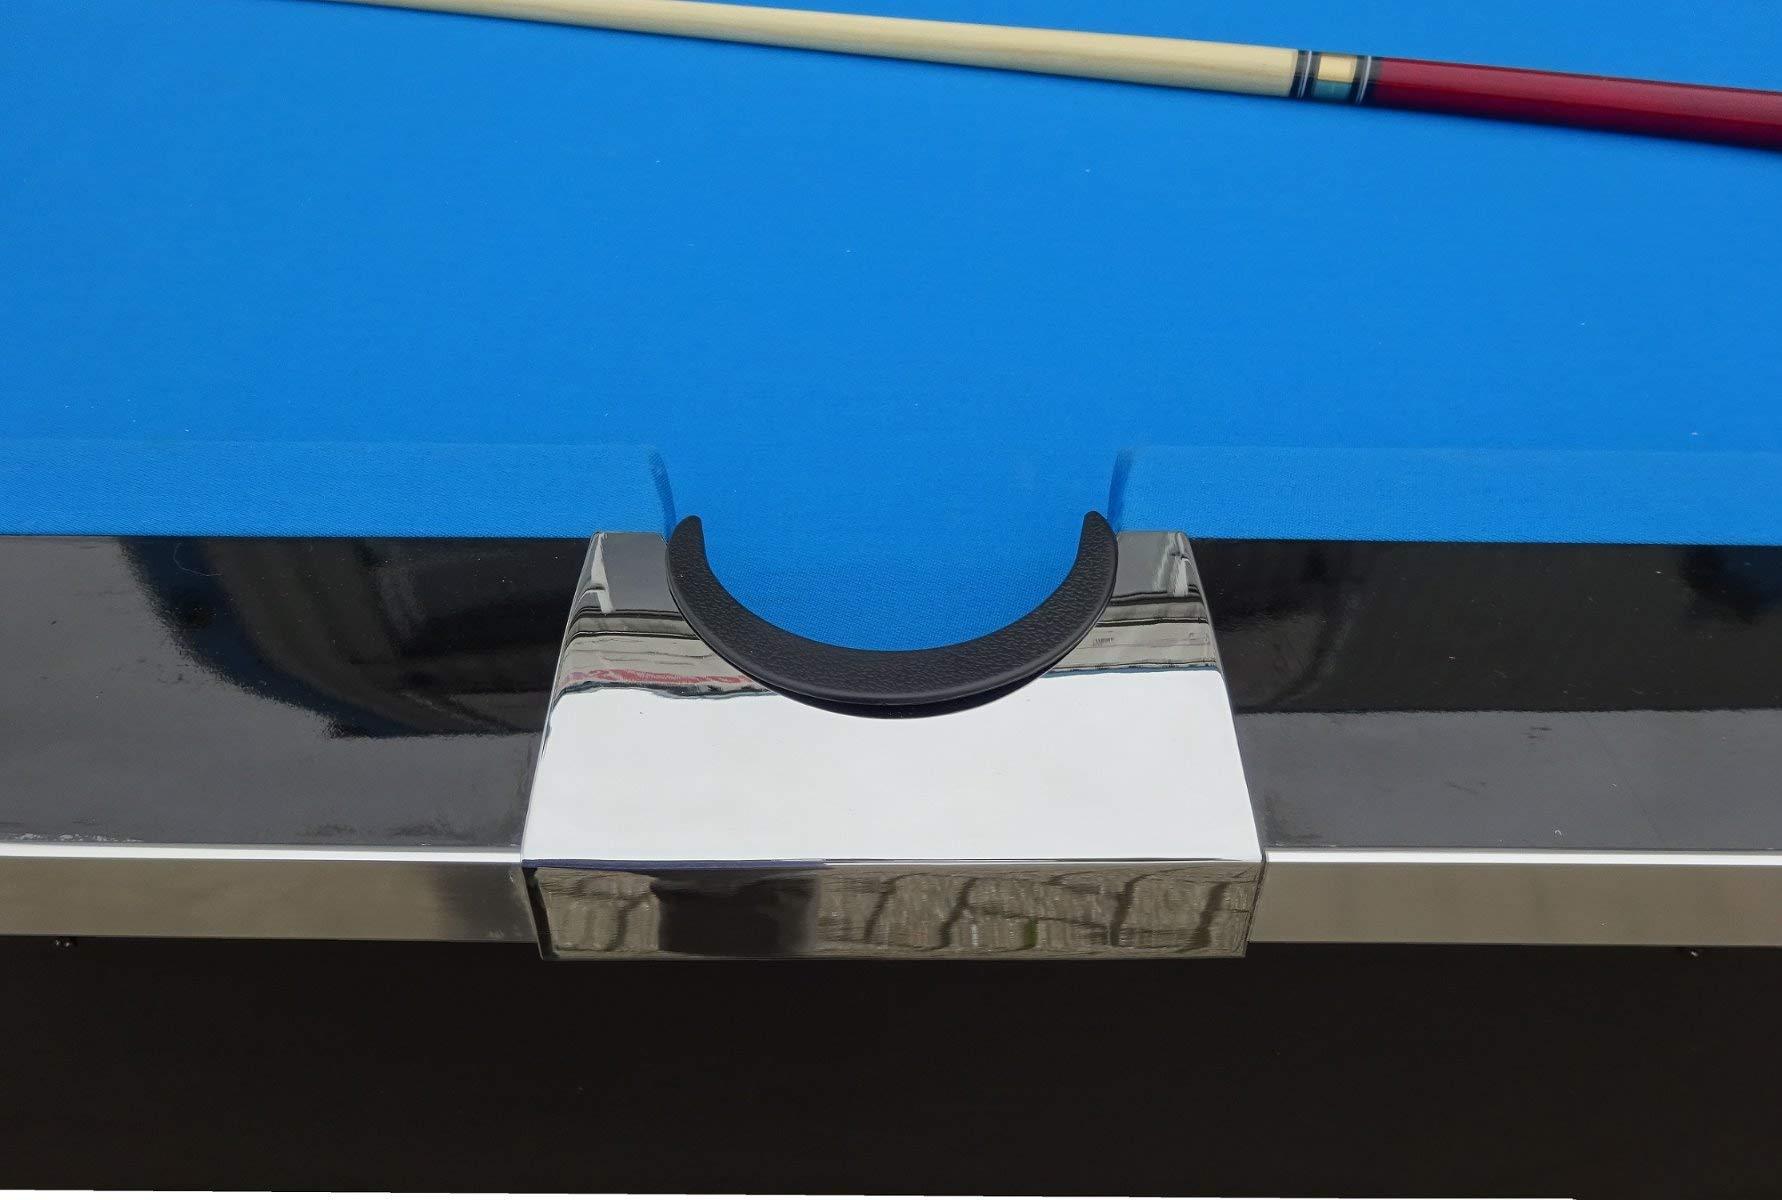 BuckShot Mesa de Billar Lemans 7ft 2 Leg - 213x121 cm - 320kg ...